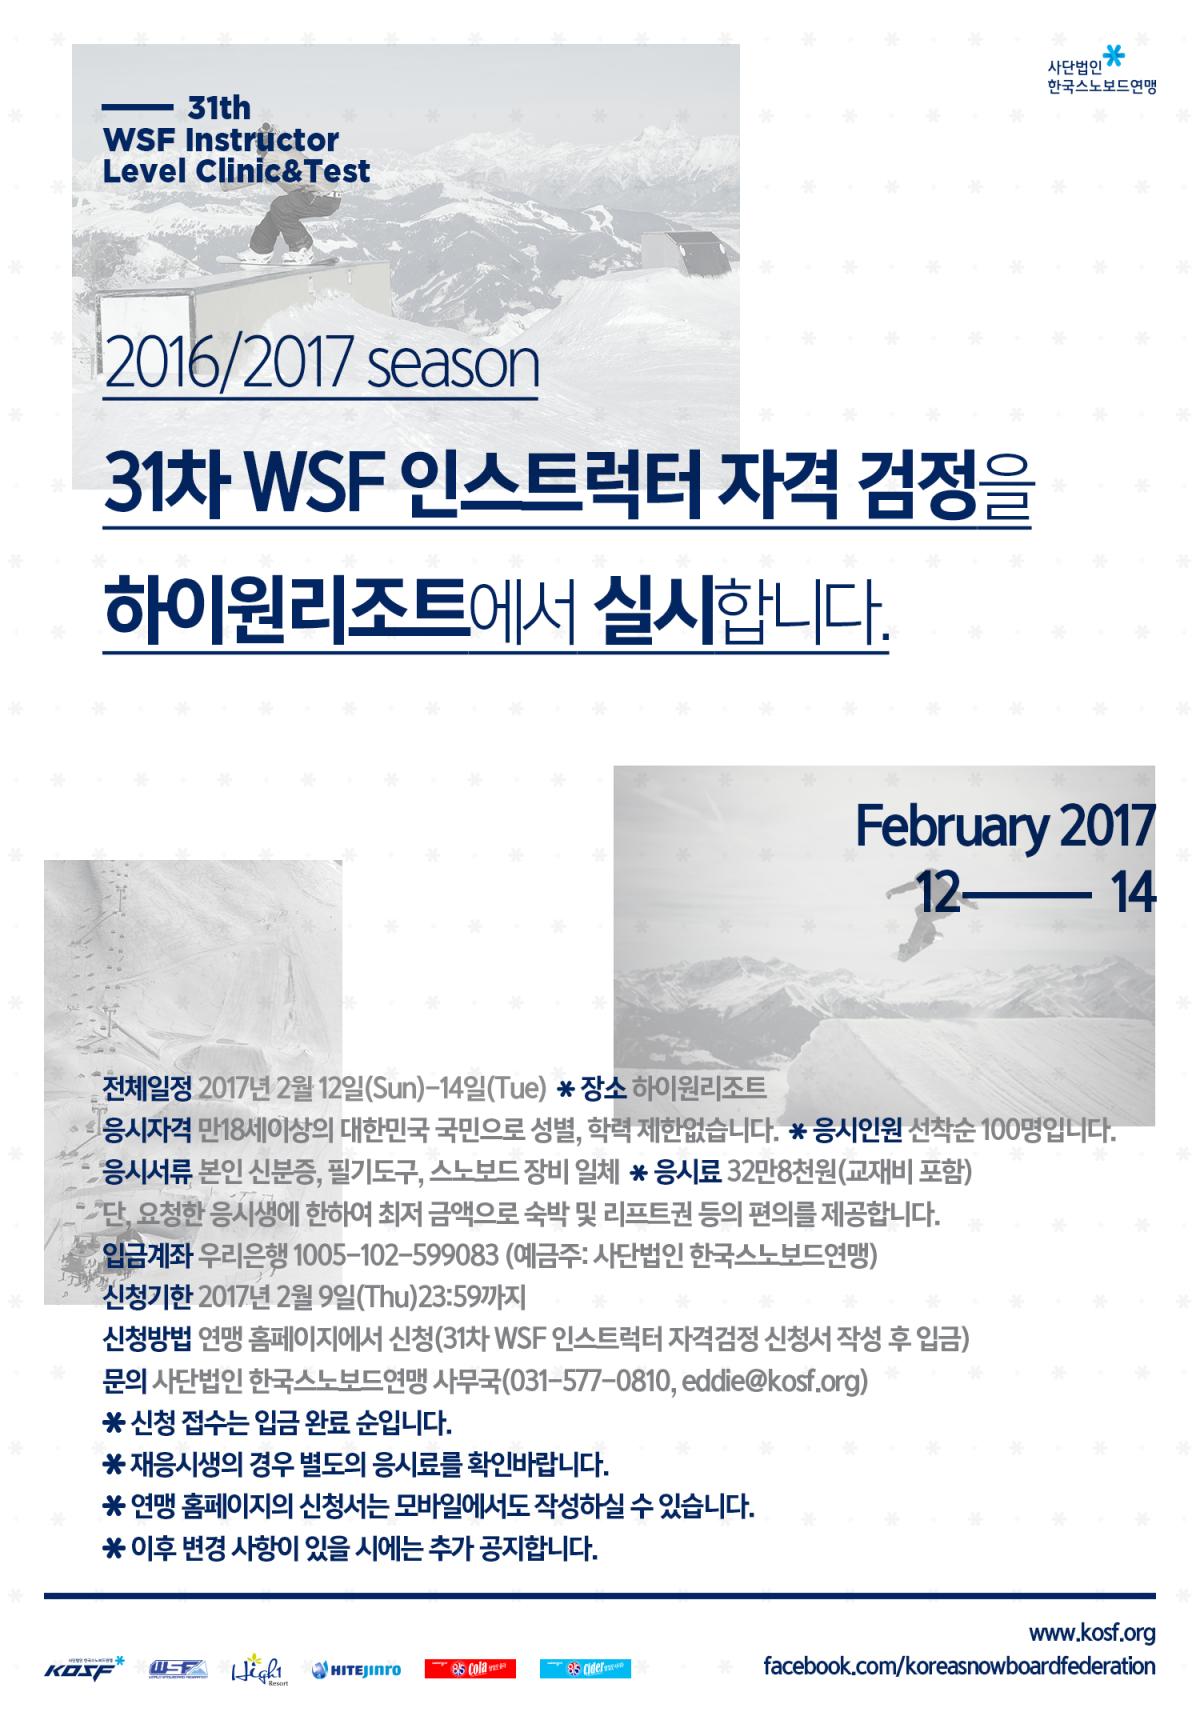 kosf_31thWSFinstructor_test20170212_01.png